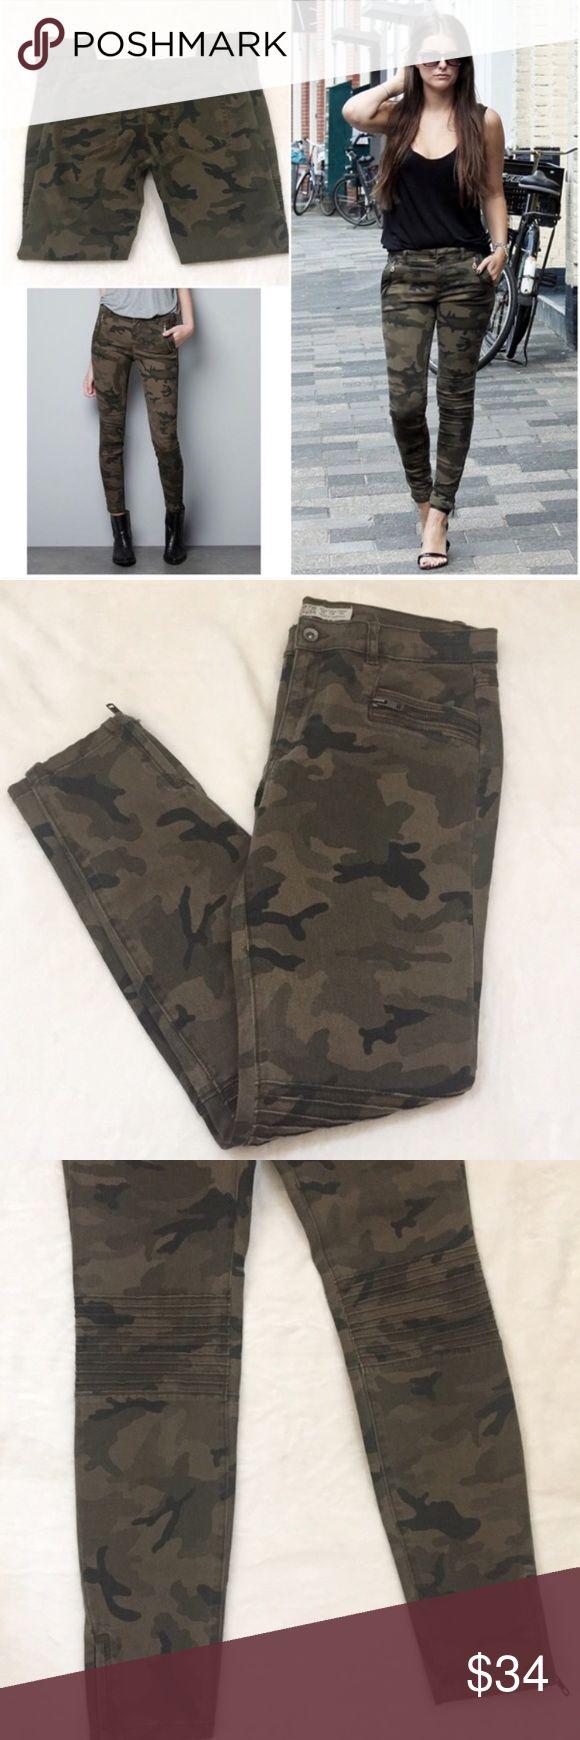 Zara Moro Skinny Ankle Zip Camouflage Jeans Moto style camp jeans by Zara. NWOT...no wear, tear, or stains Zara Jeans Skinny